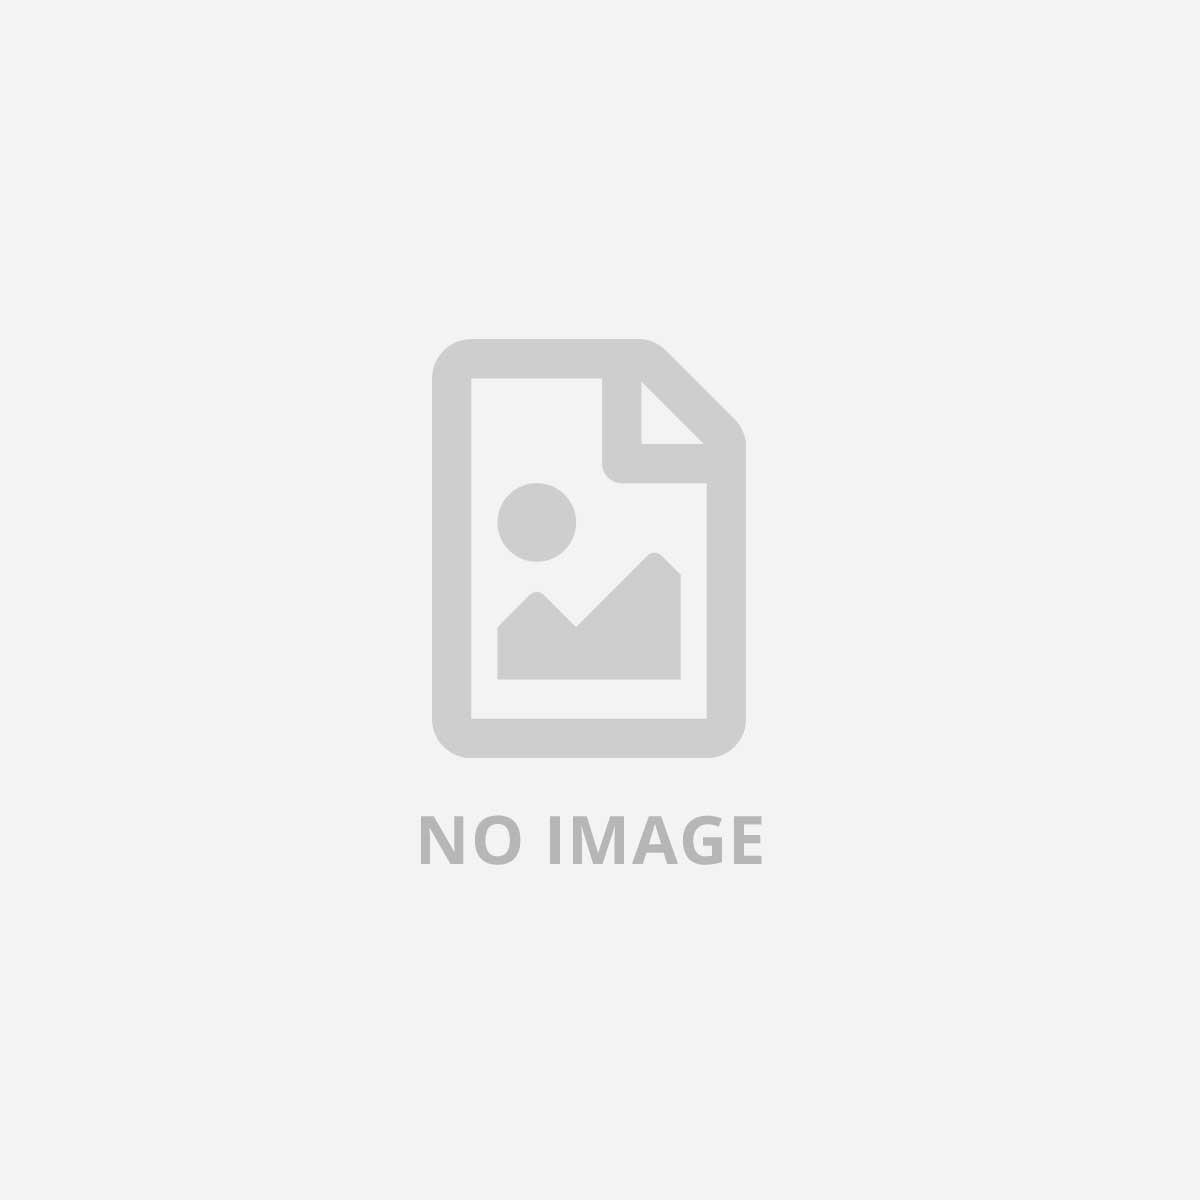 >>>HPE ETH 1GB 2P 368FLR-MMT ADPTR